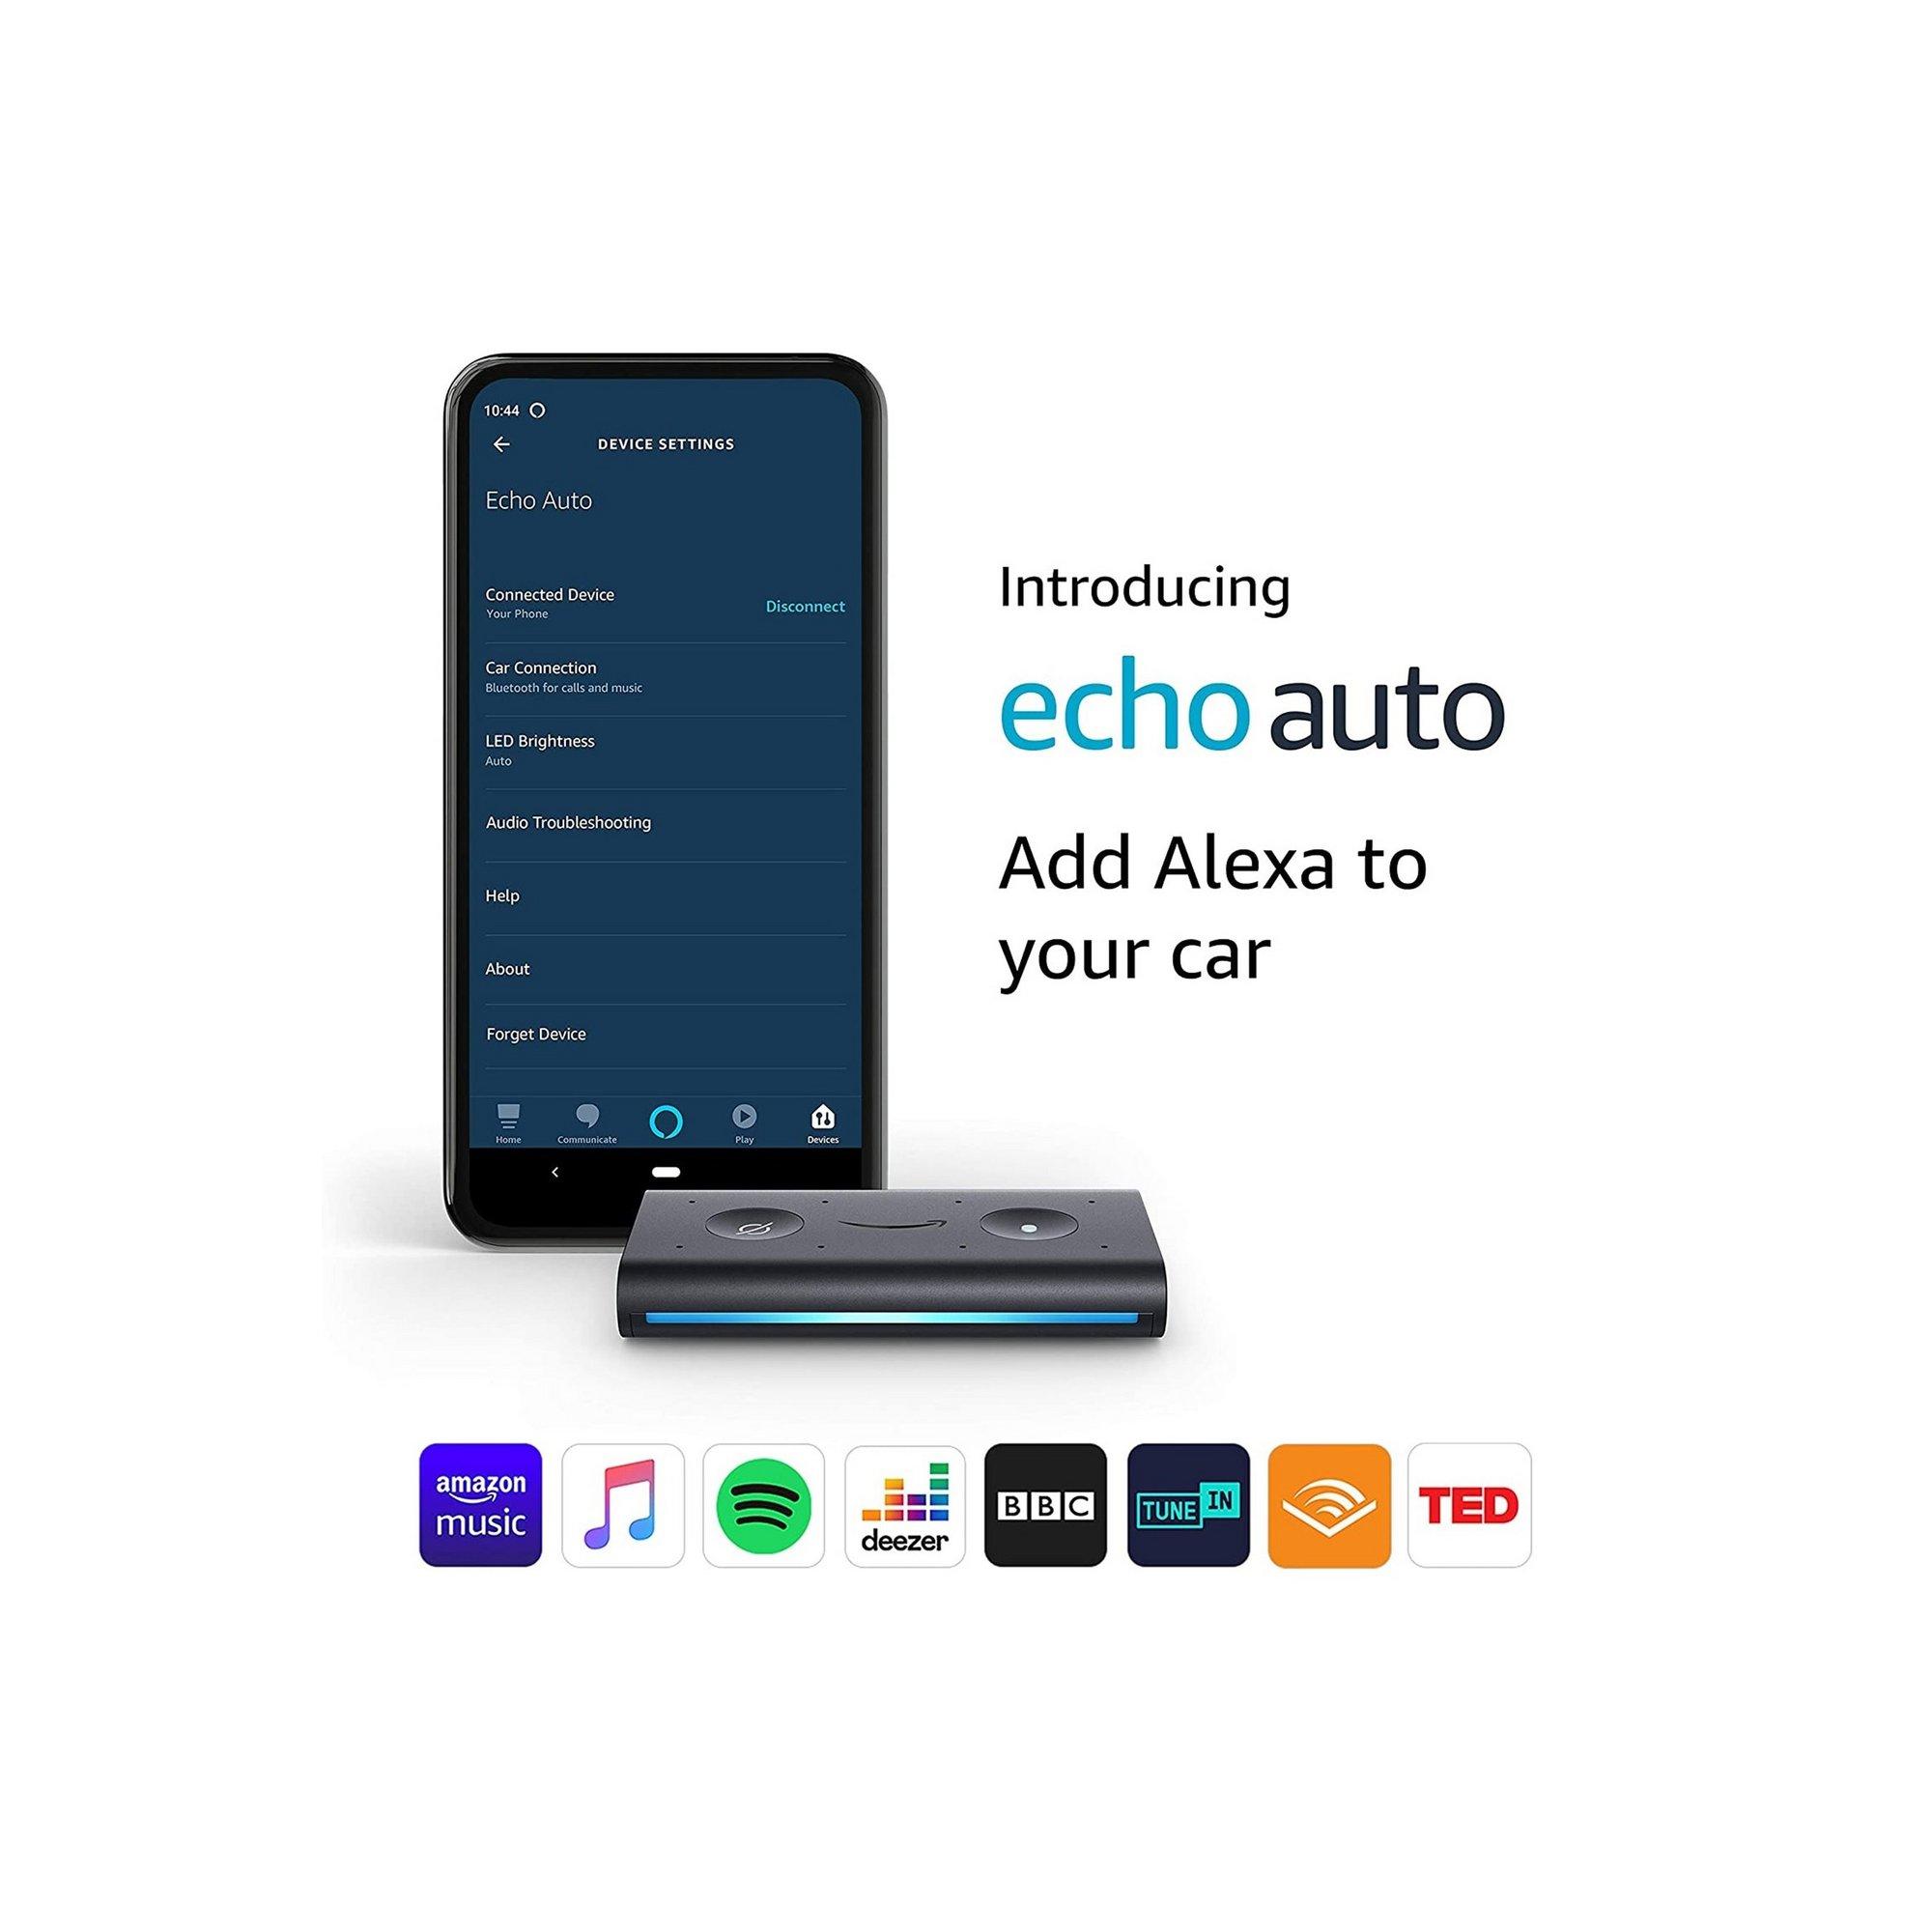 Image of Amazon Echo Auto